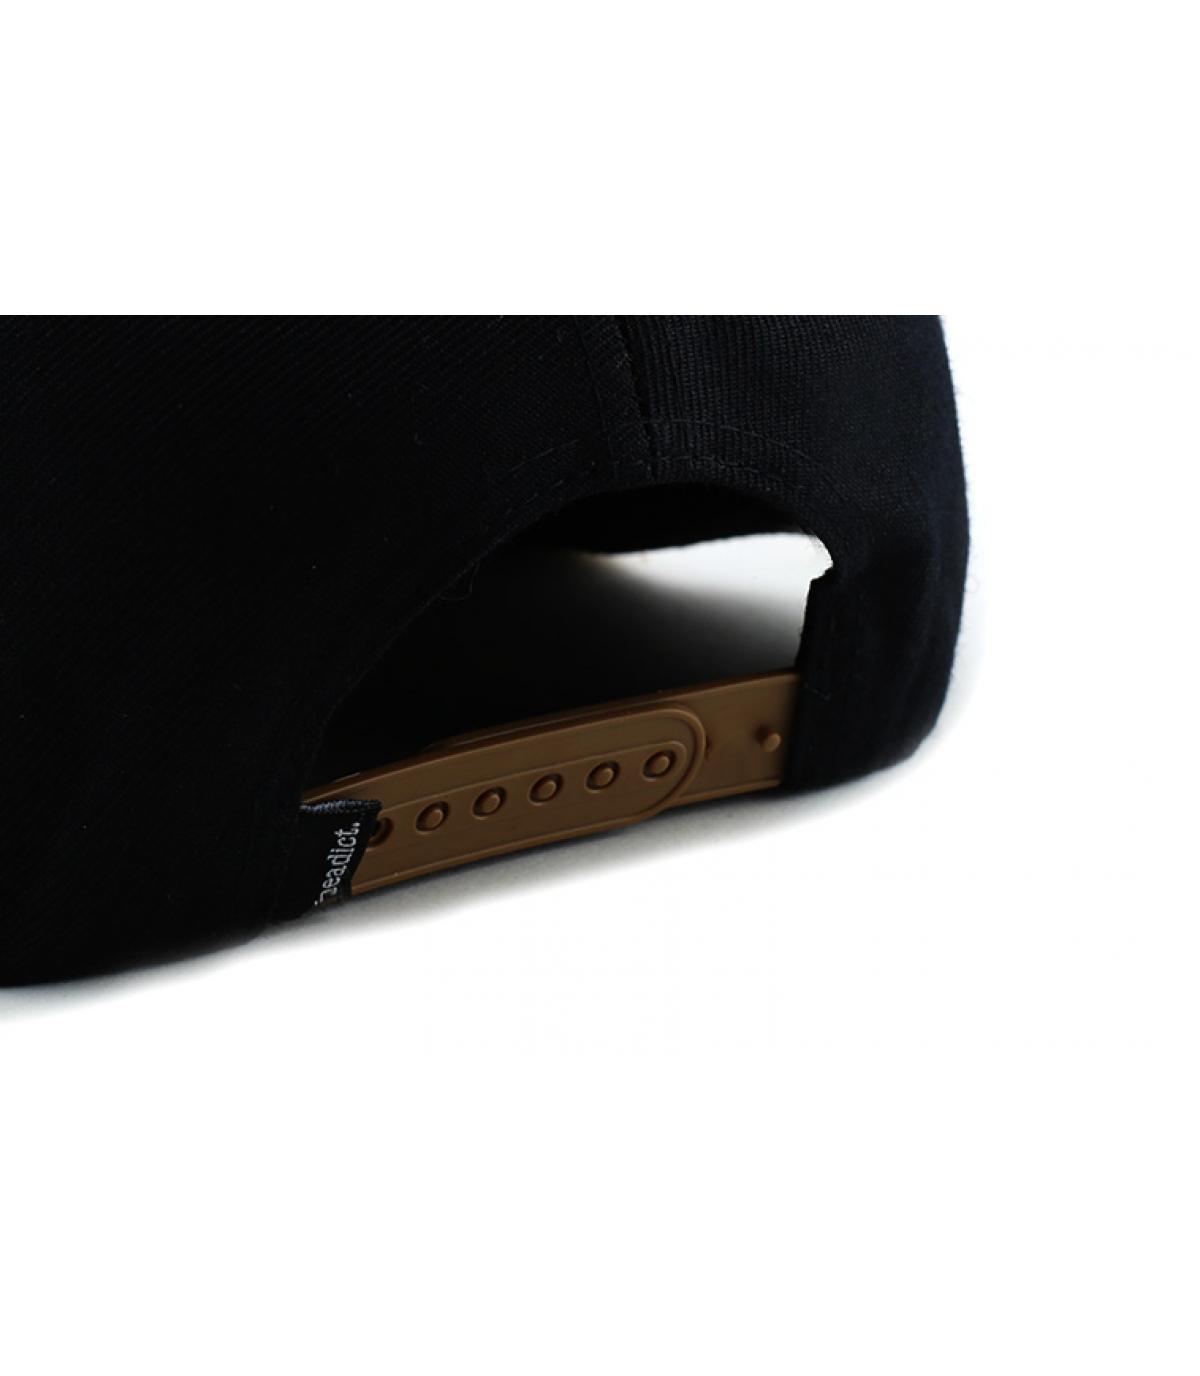 Details Snapback Chifoumi black brown - afbeeling 5